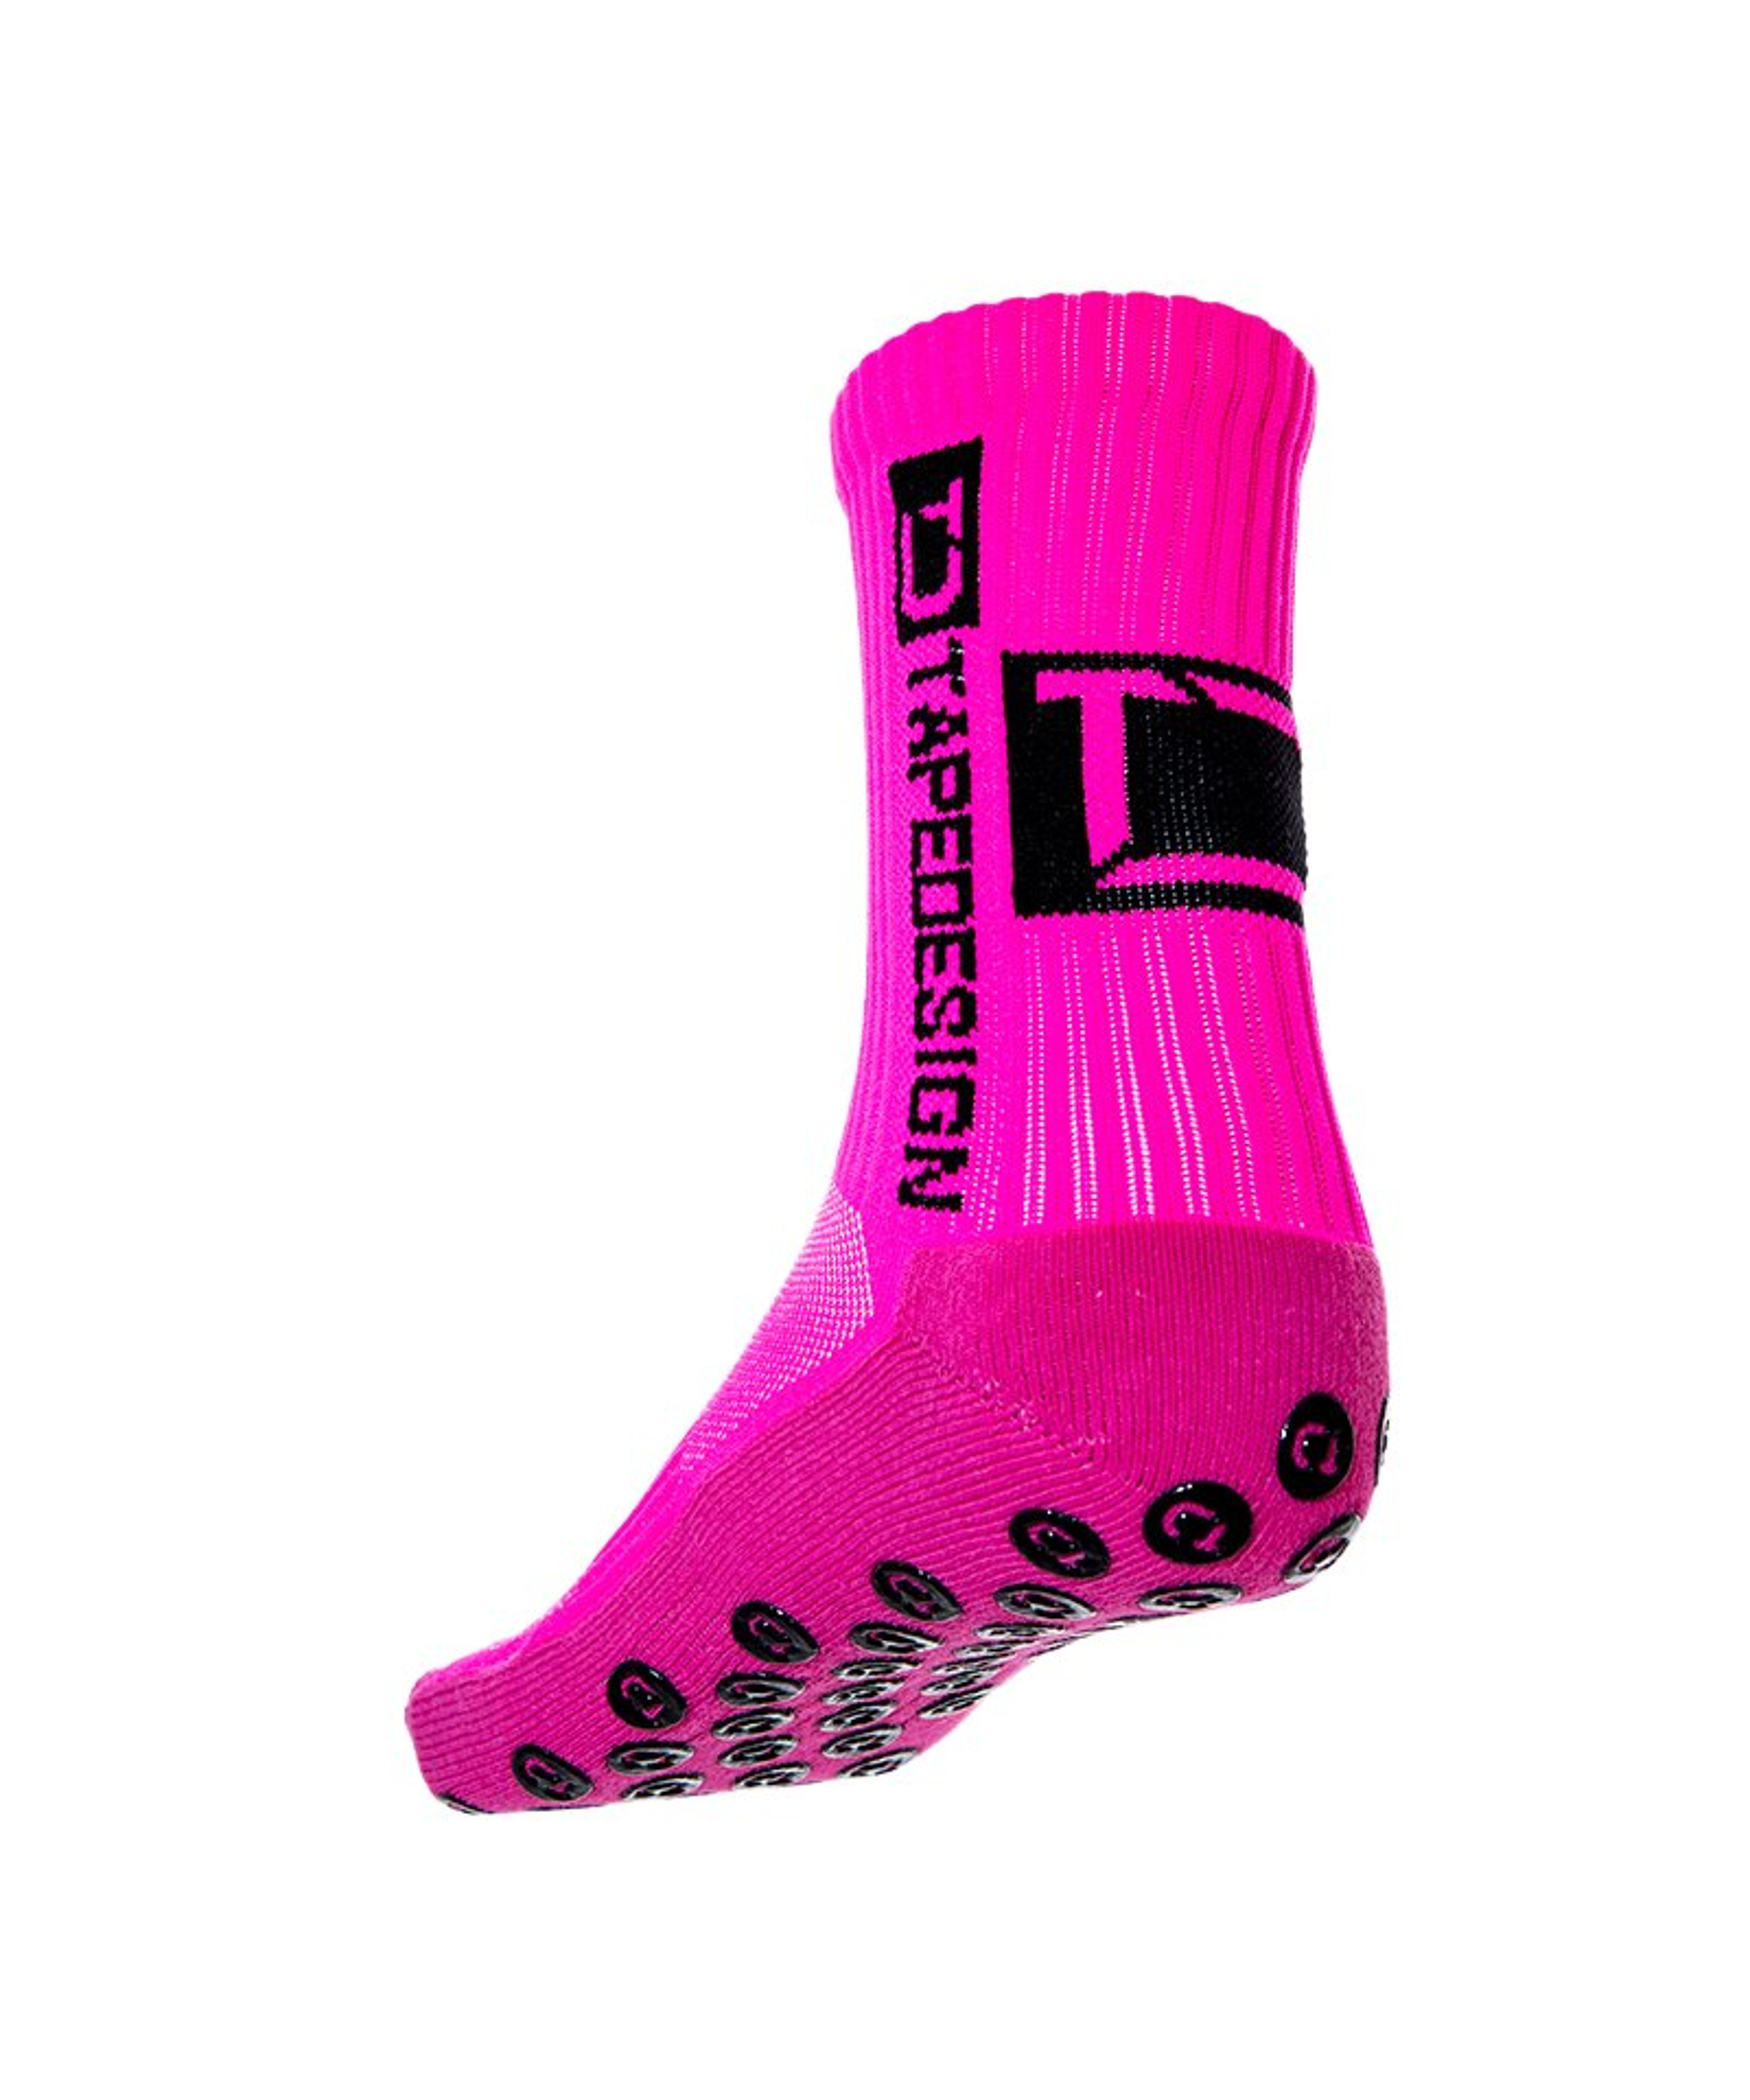 Tapedesign Socks Socken Neonpink F011 - pink